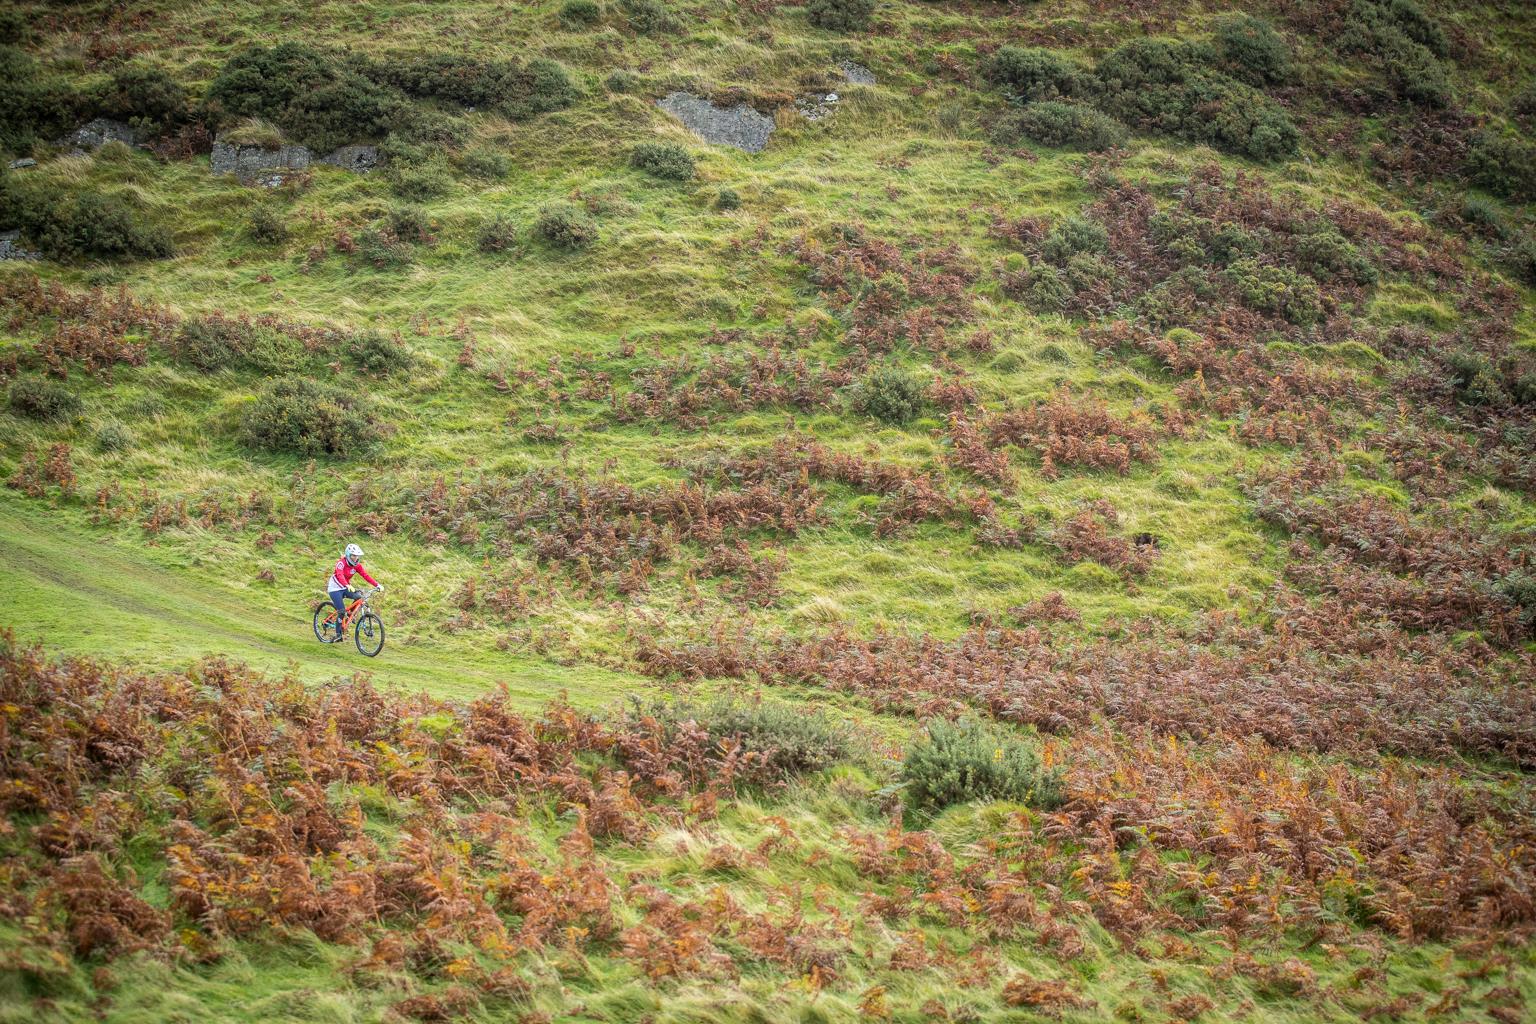 Faya - Fitness On Toast - Wales EE 4G Balloon Signal Bike Rural Apple Watch Adventure Cyclicing Downhill Mountain Bike Biking Workout Event-16